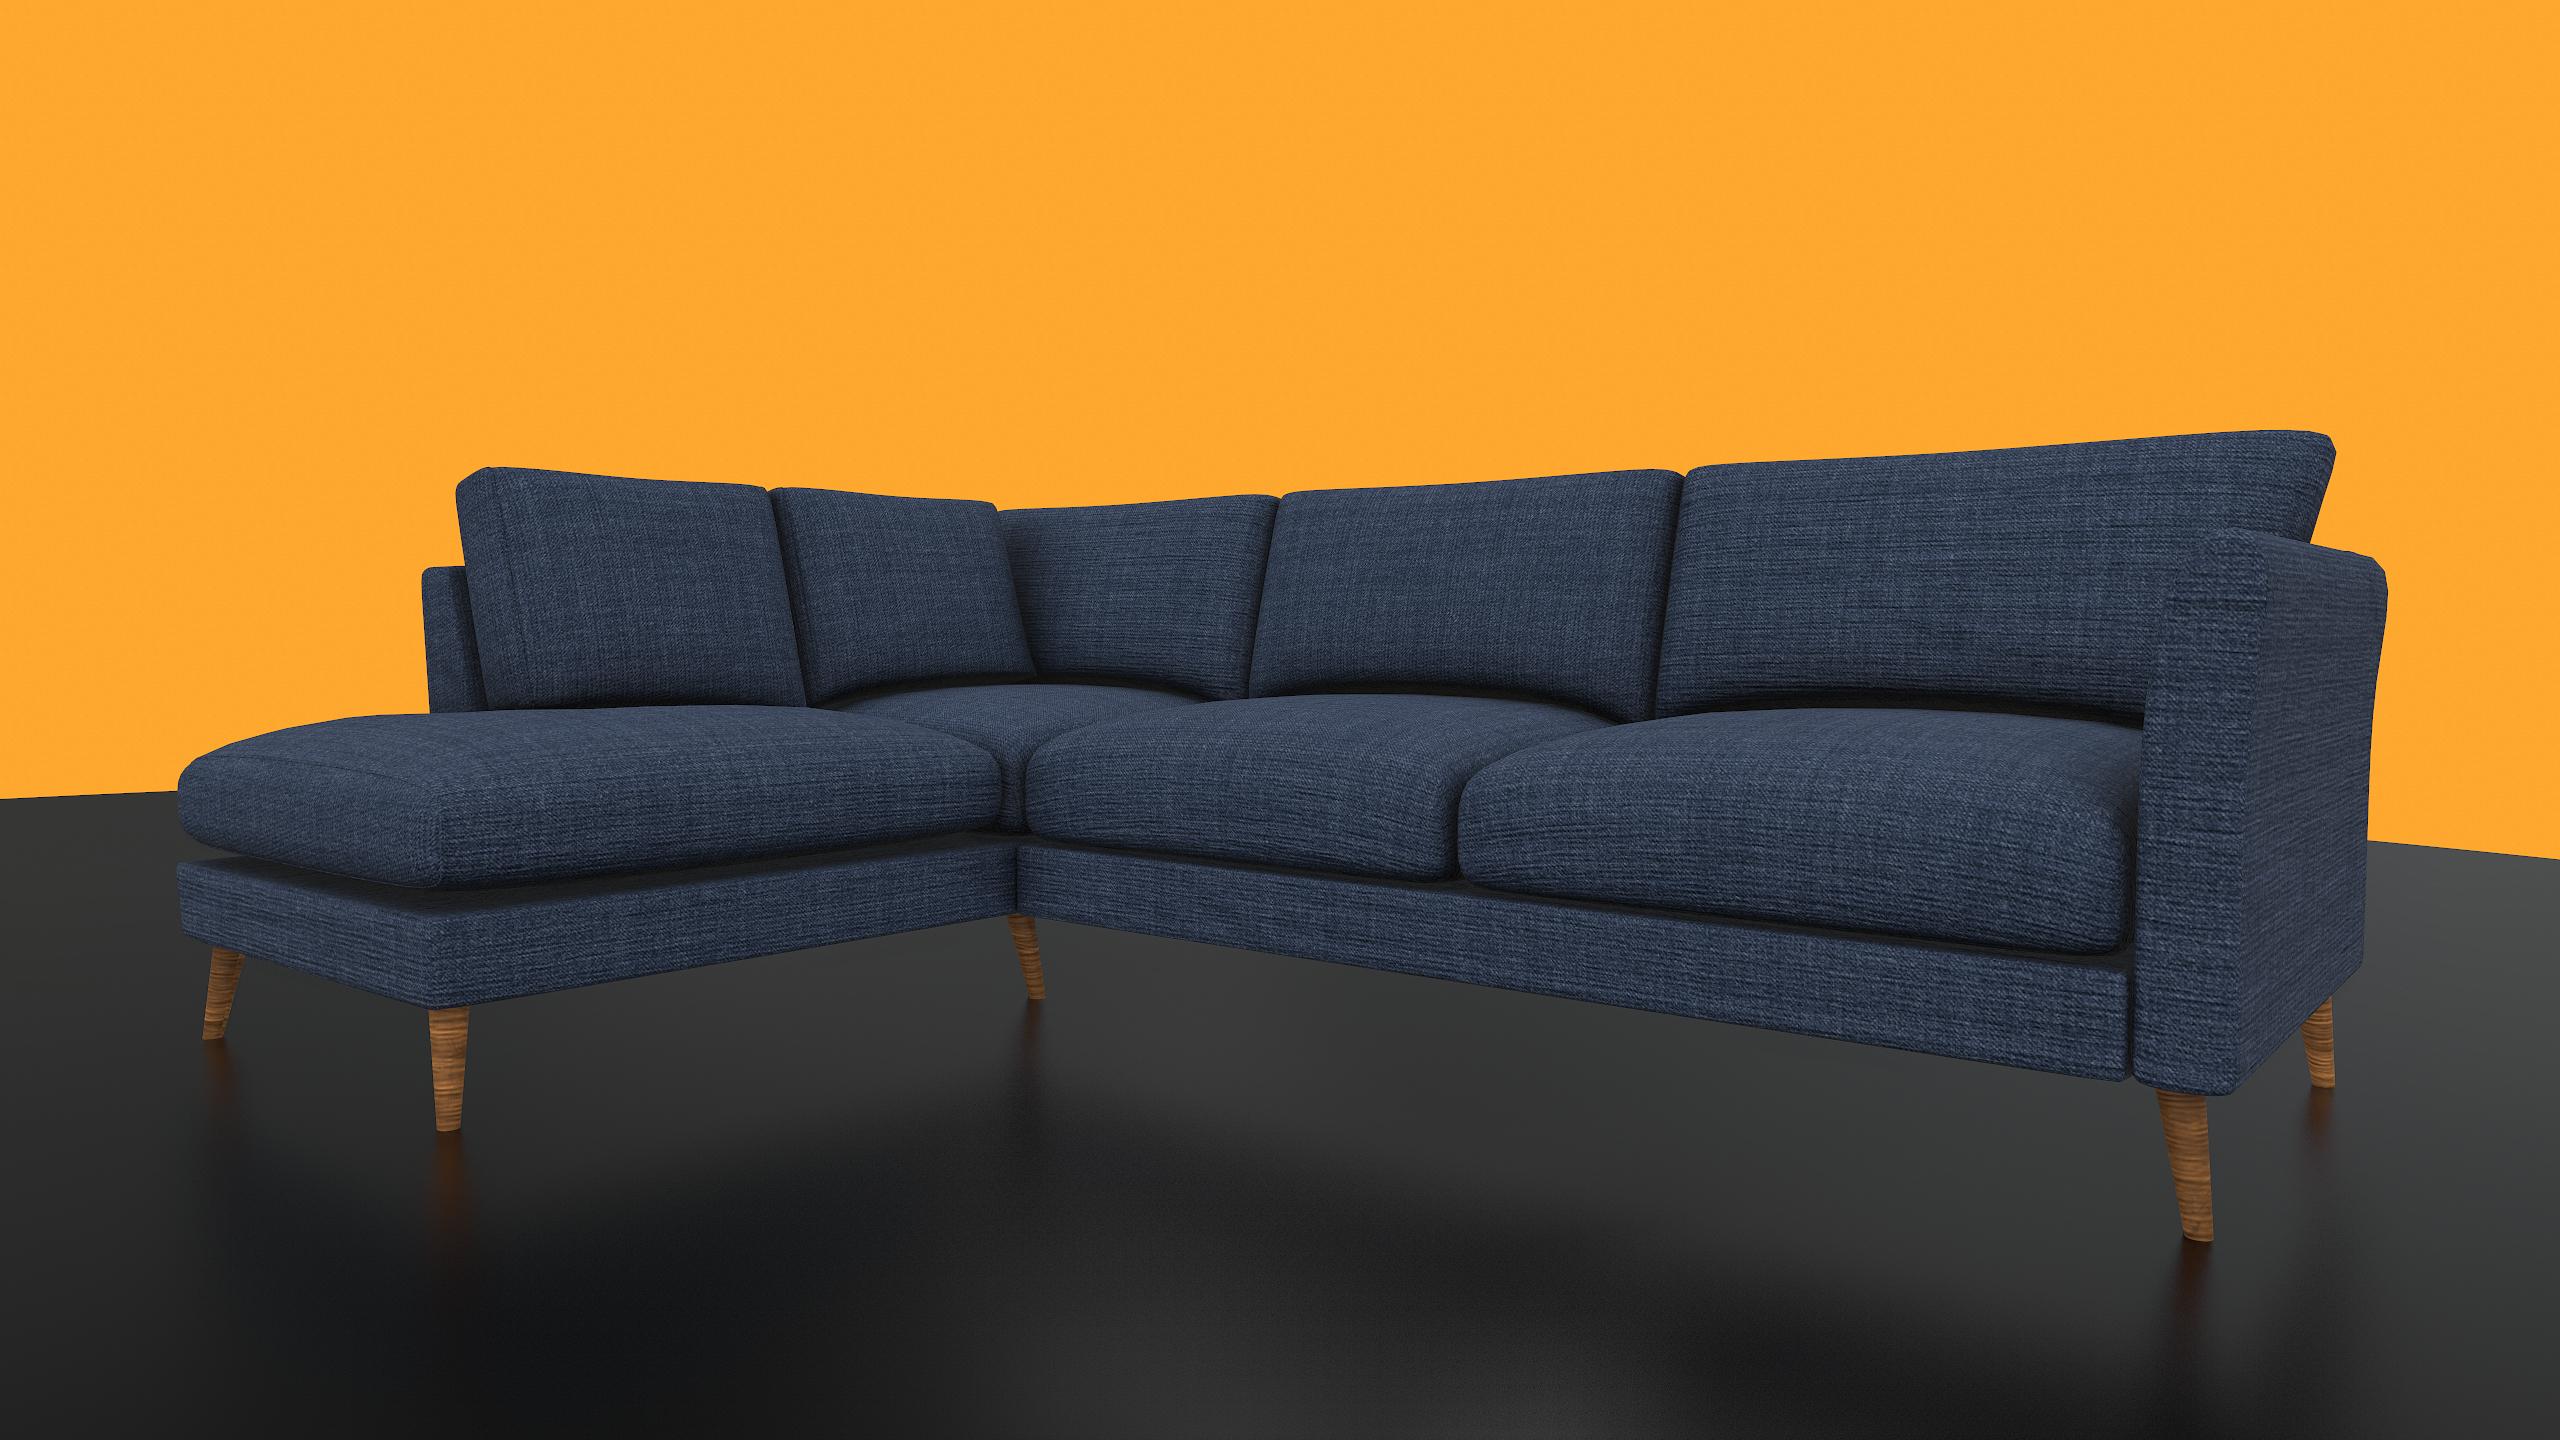 Blaue Couch Bayern 1 Heute